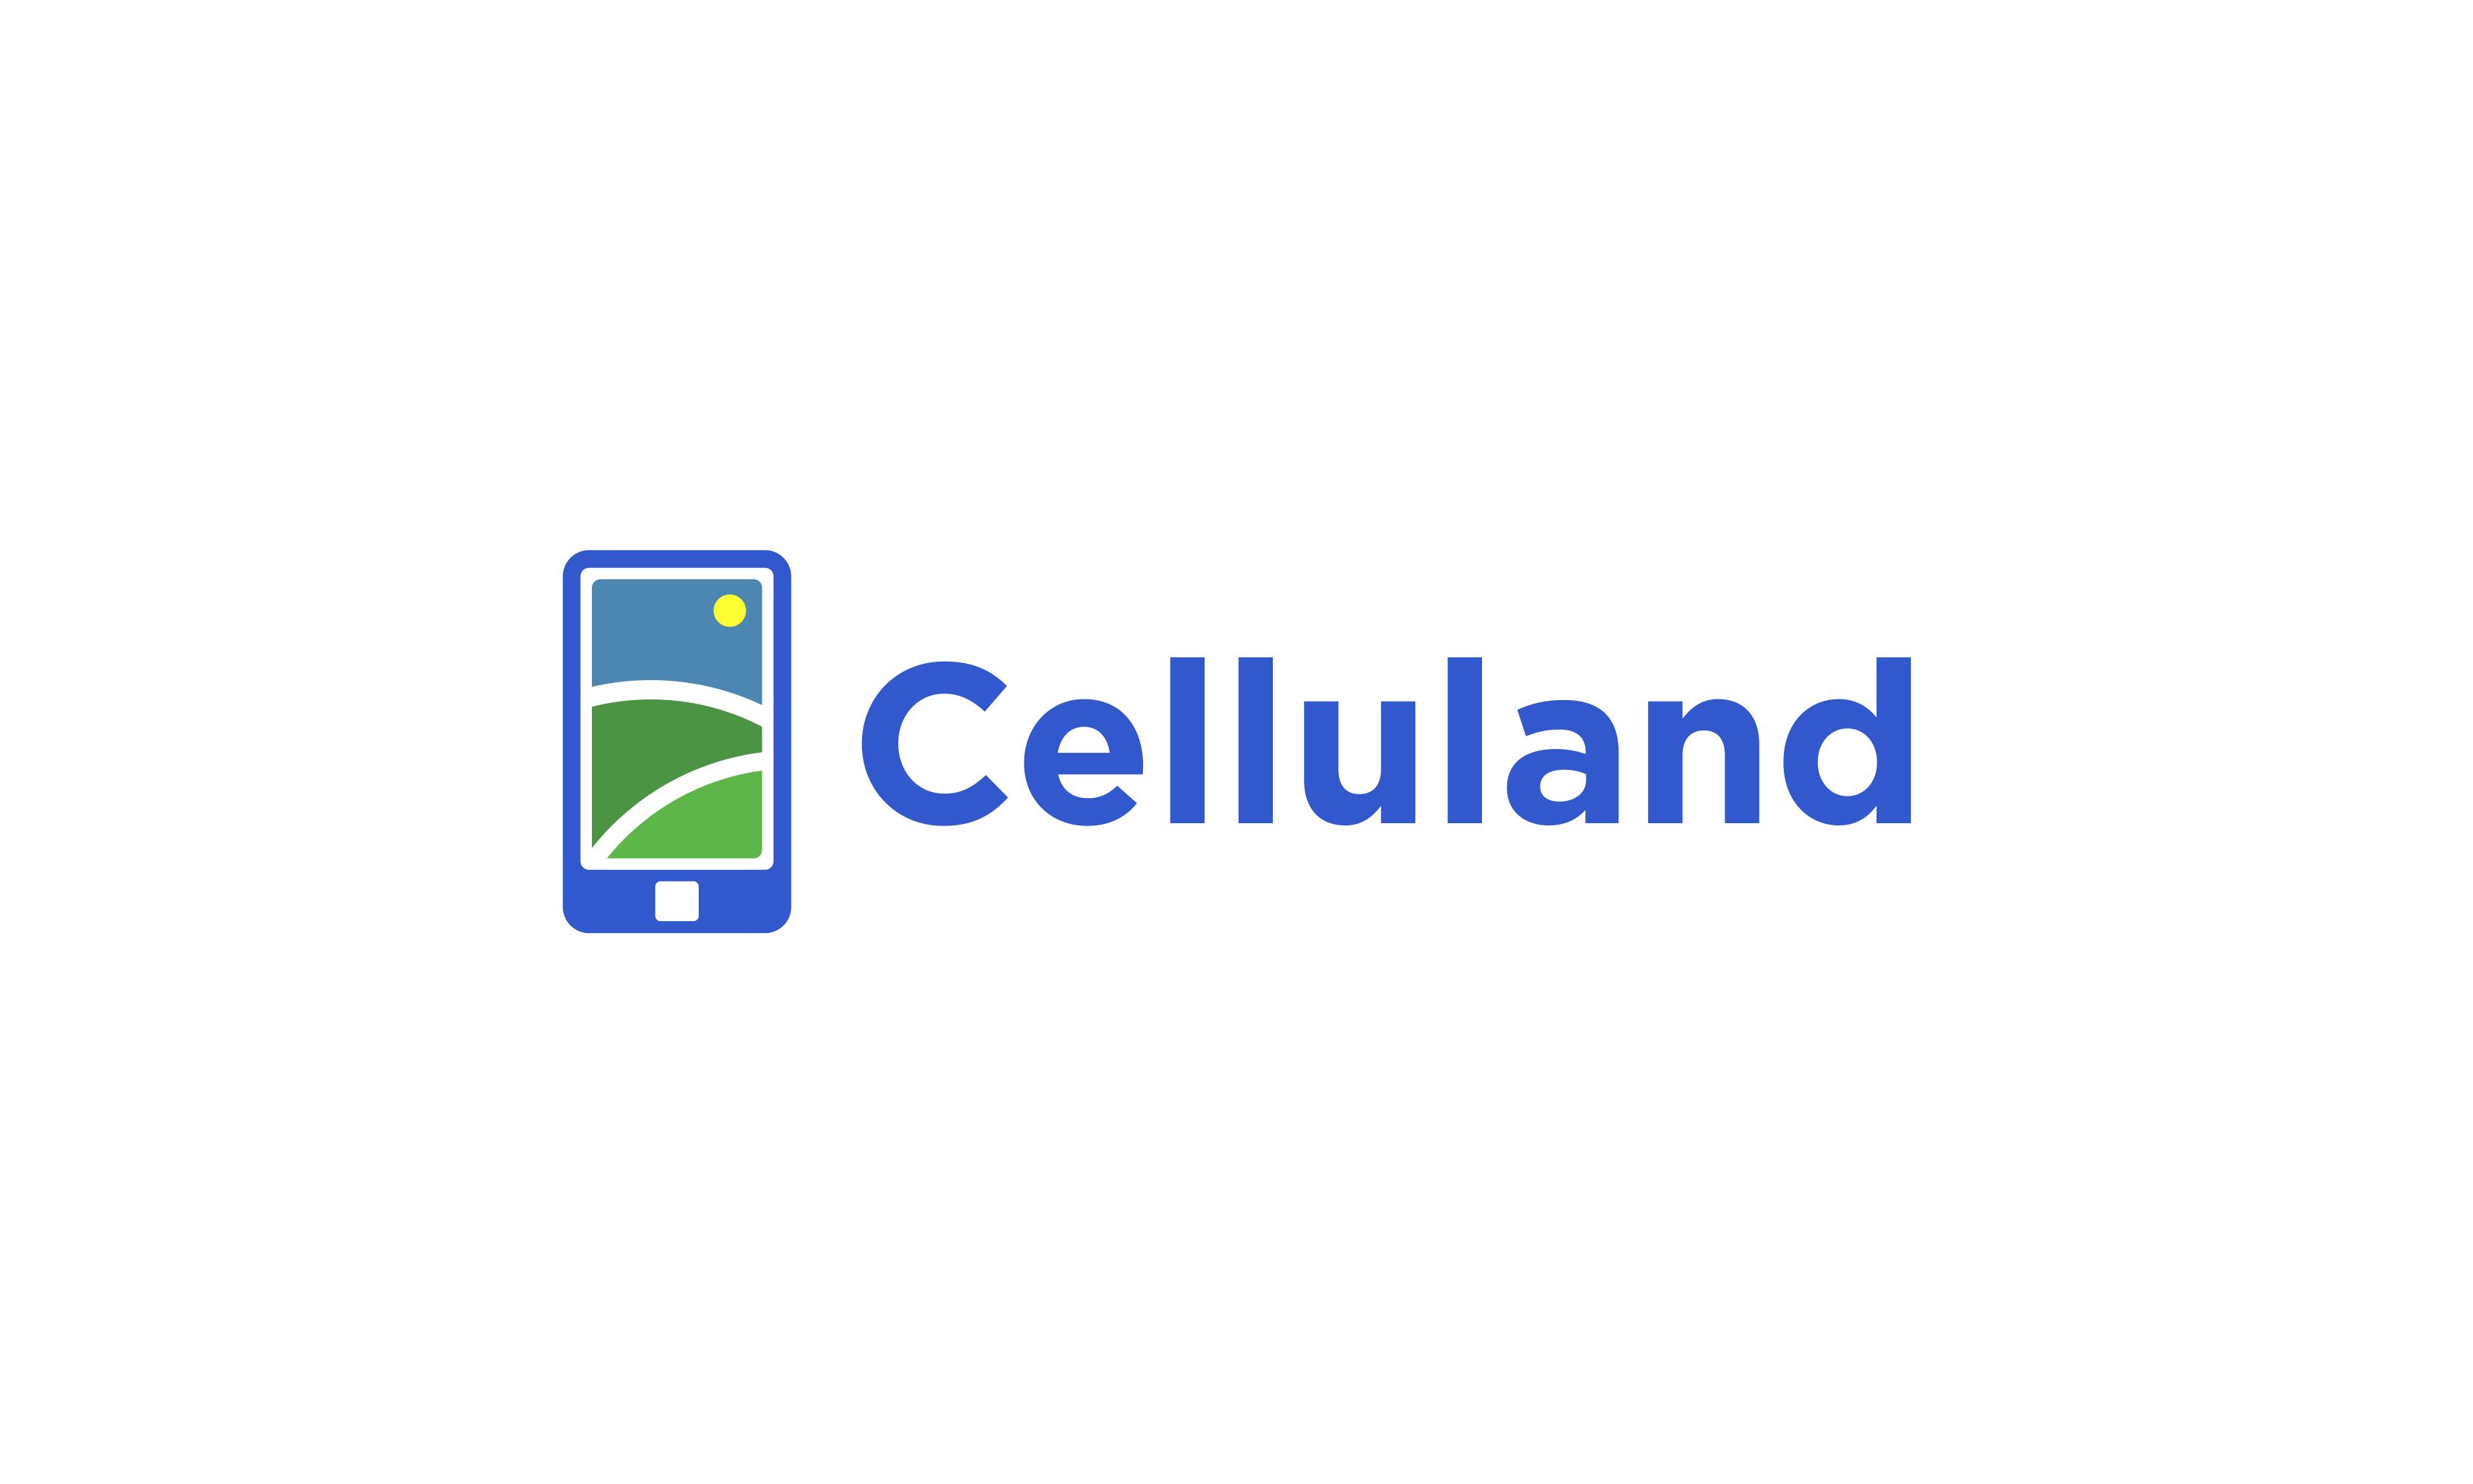 Celluland